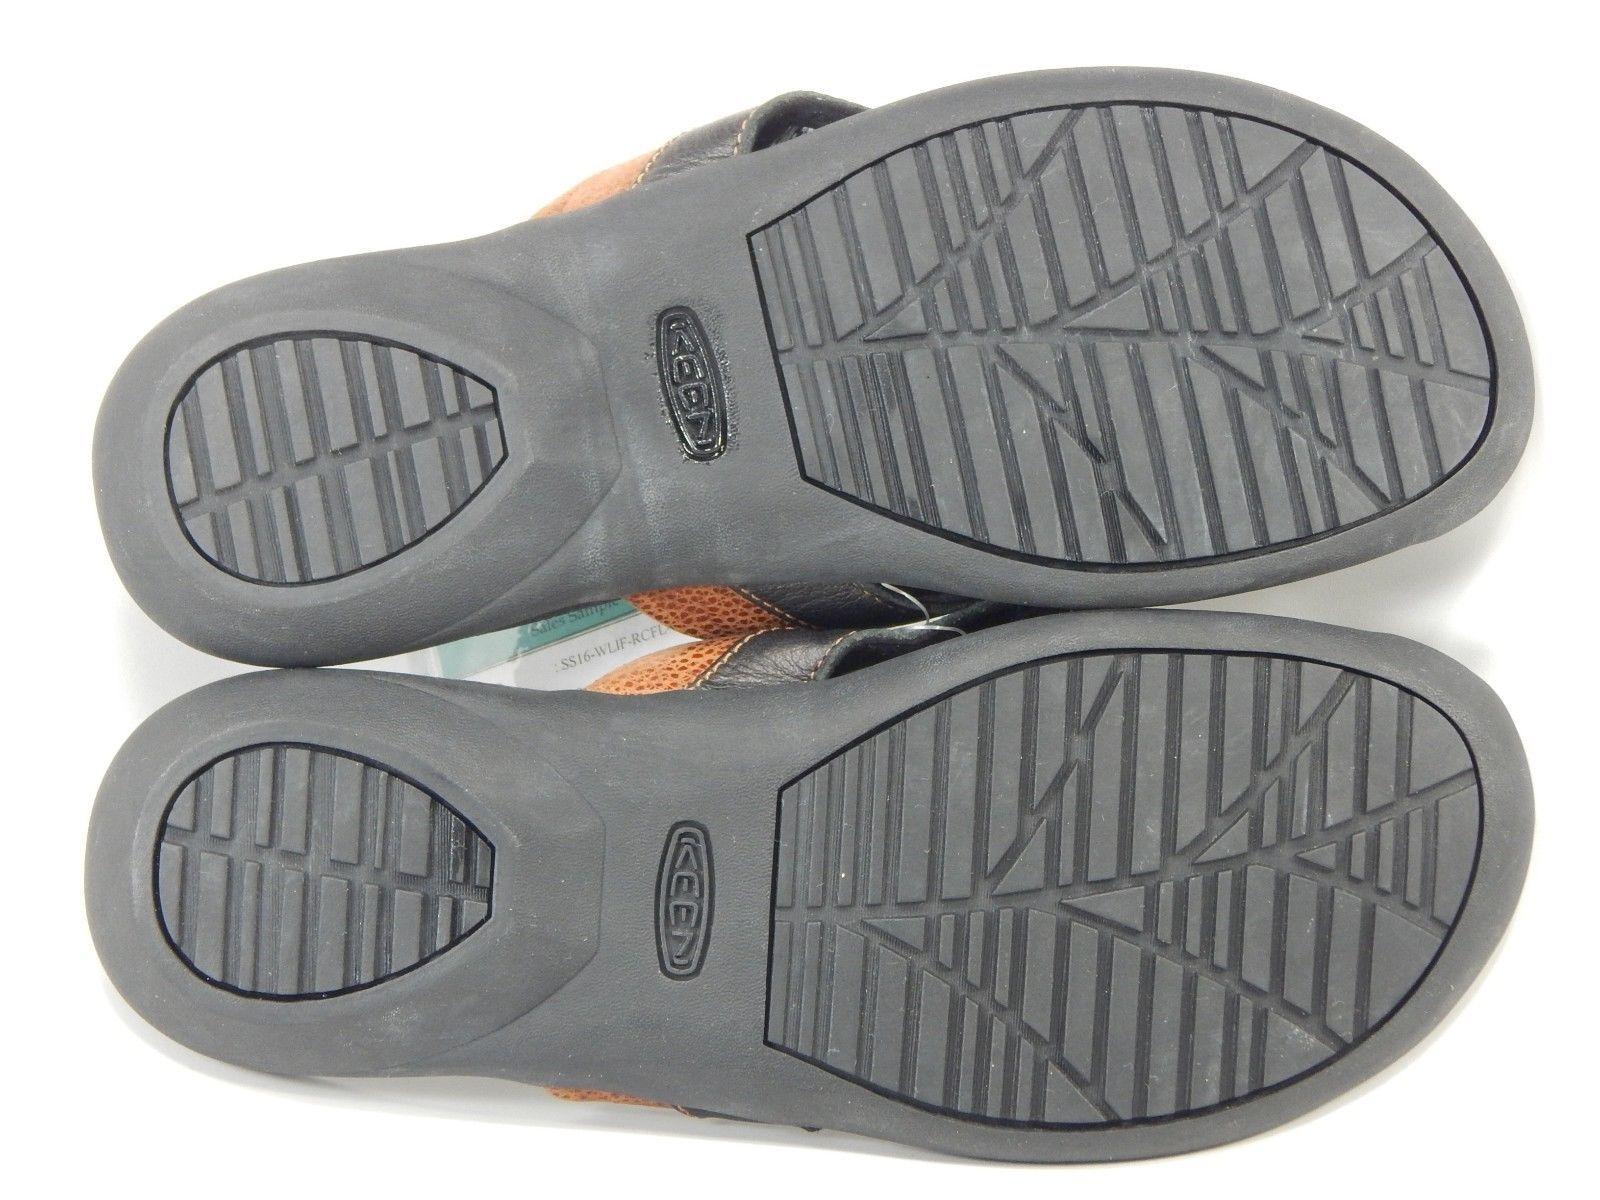 Keen Rose CIty Flip Flop Women's Sport Sandals Size 7 M EU 37.5 Black Tortoise